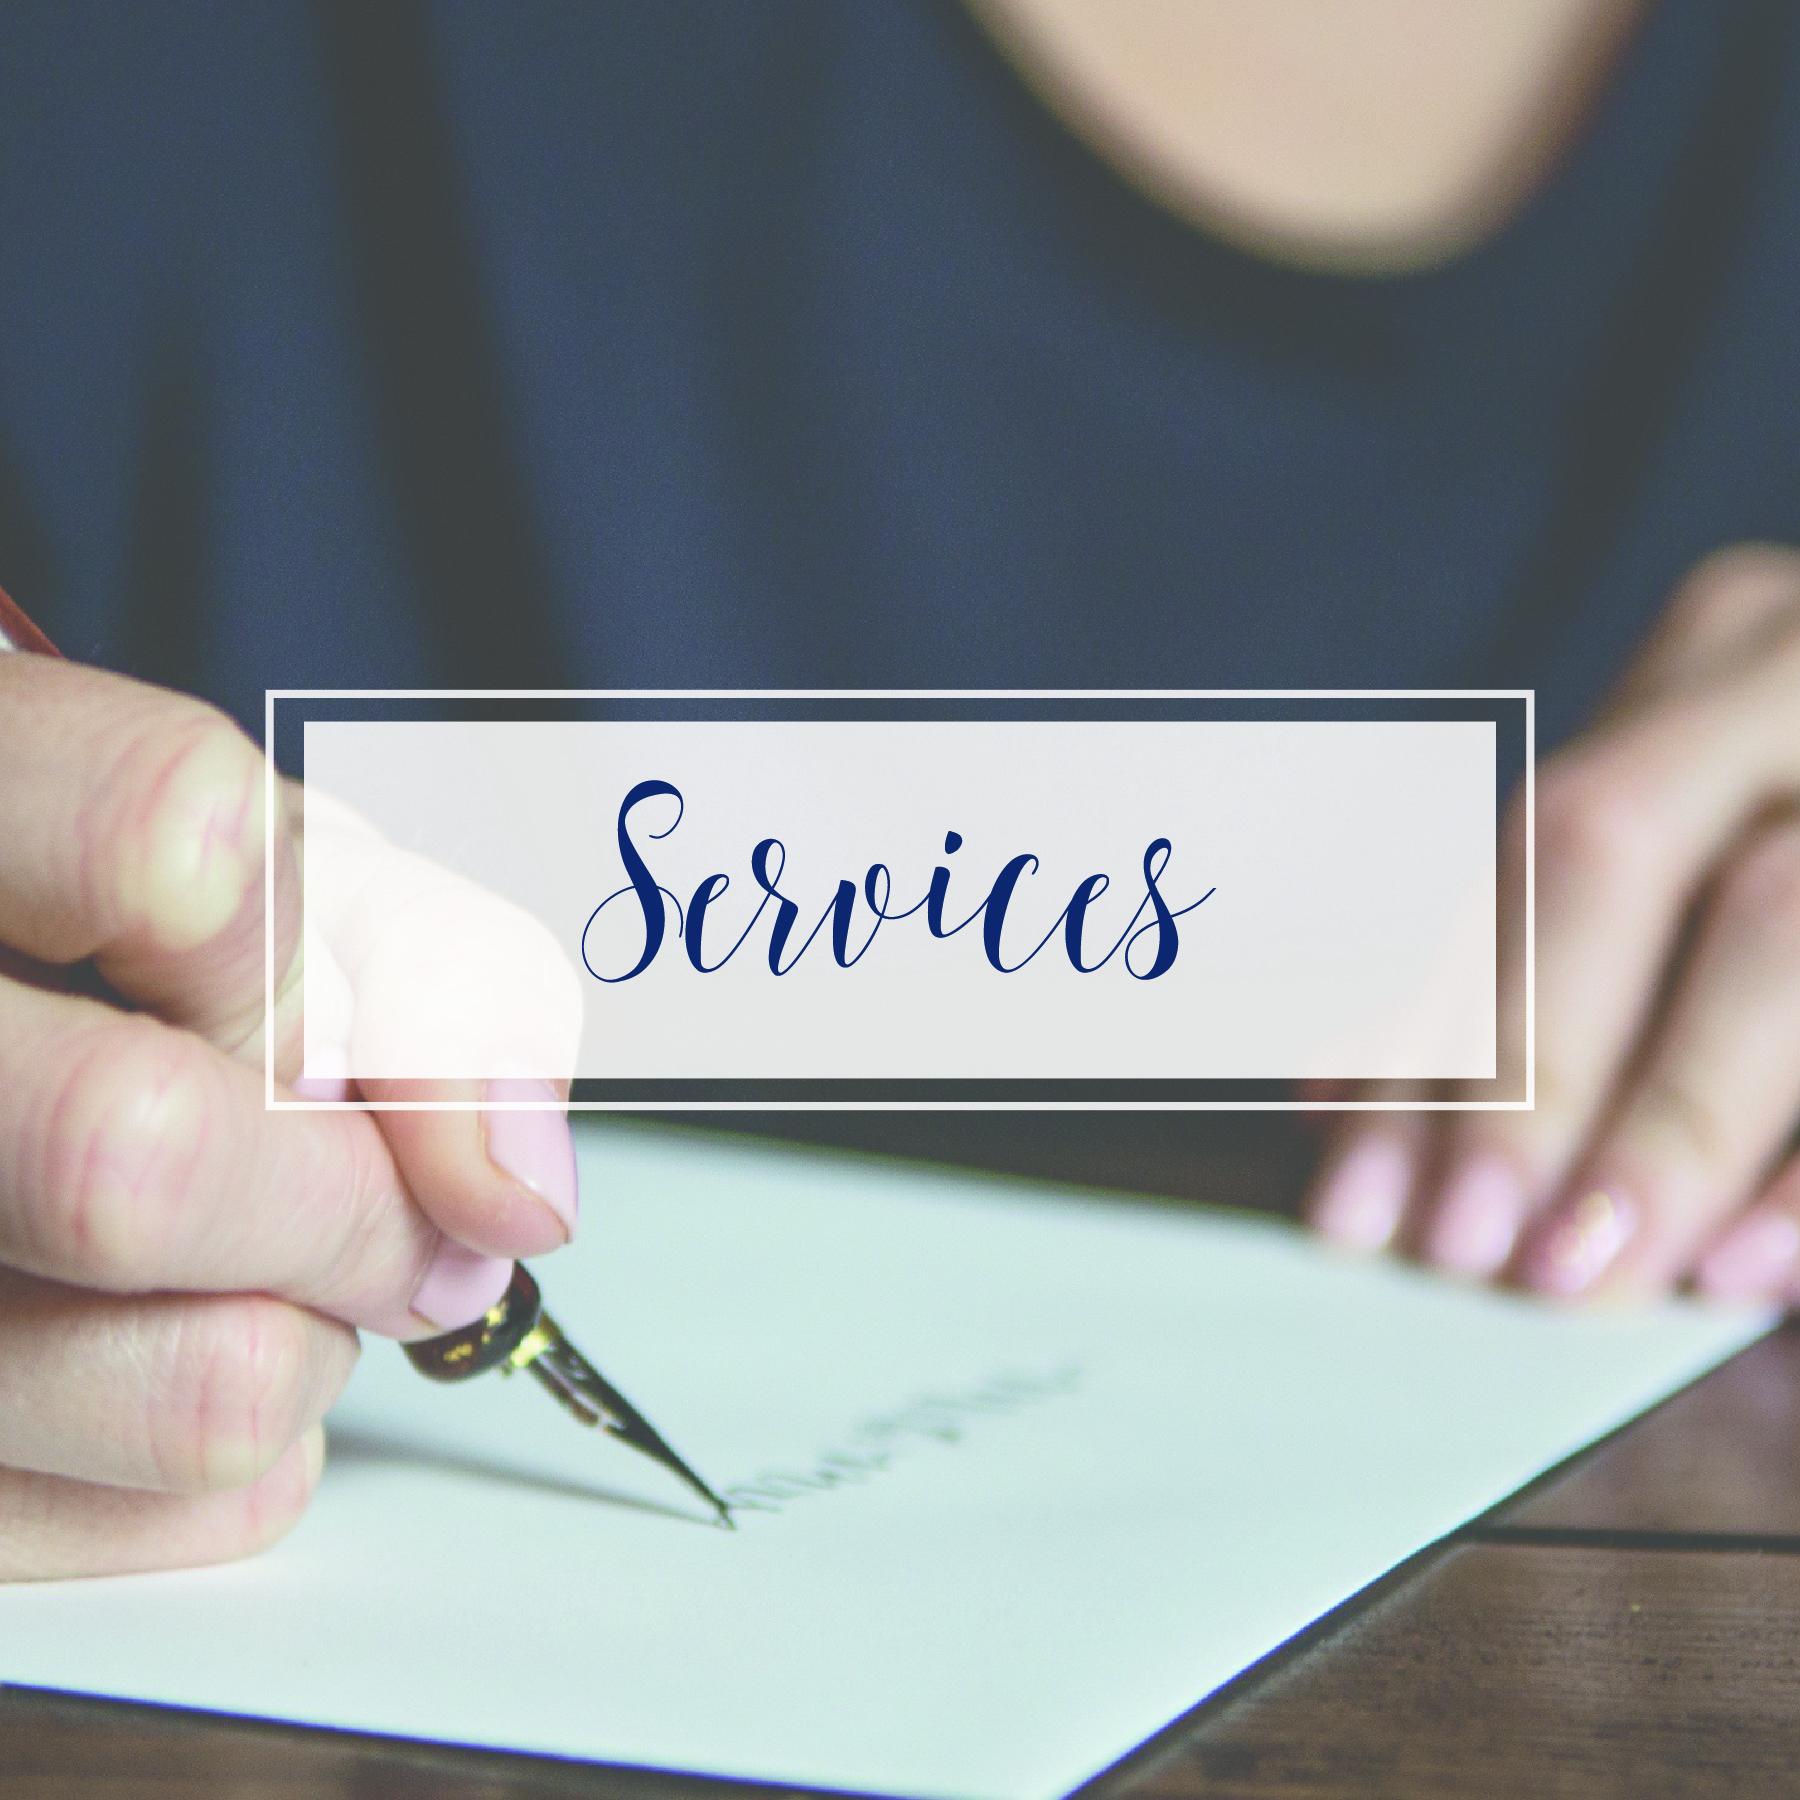 Services-01.jpg